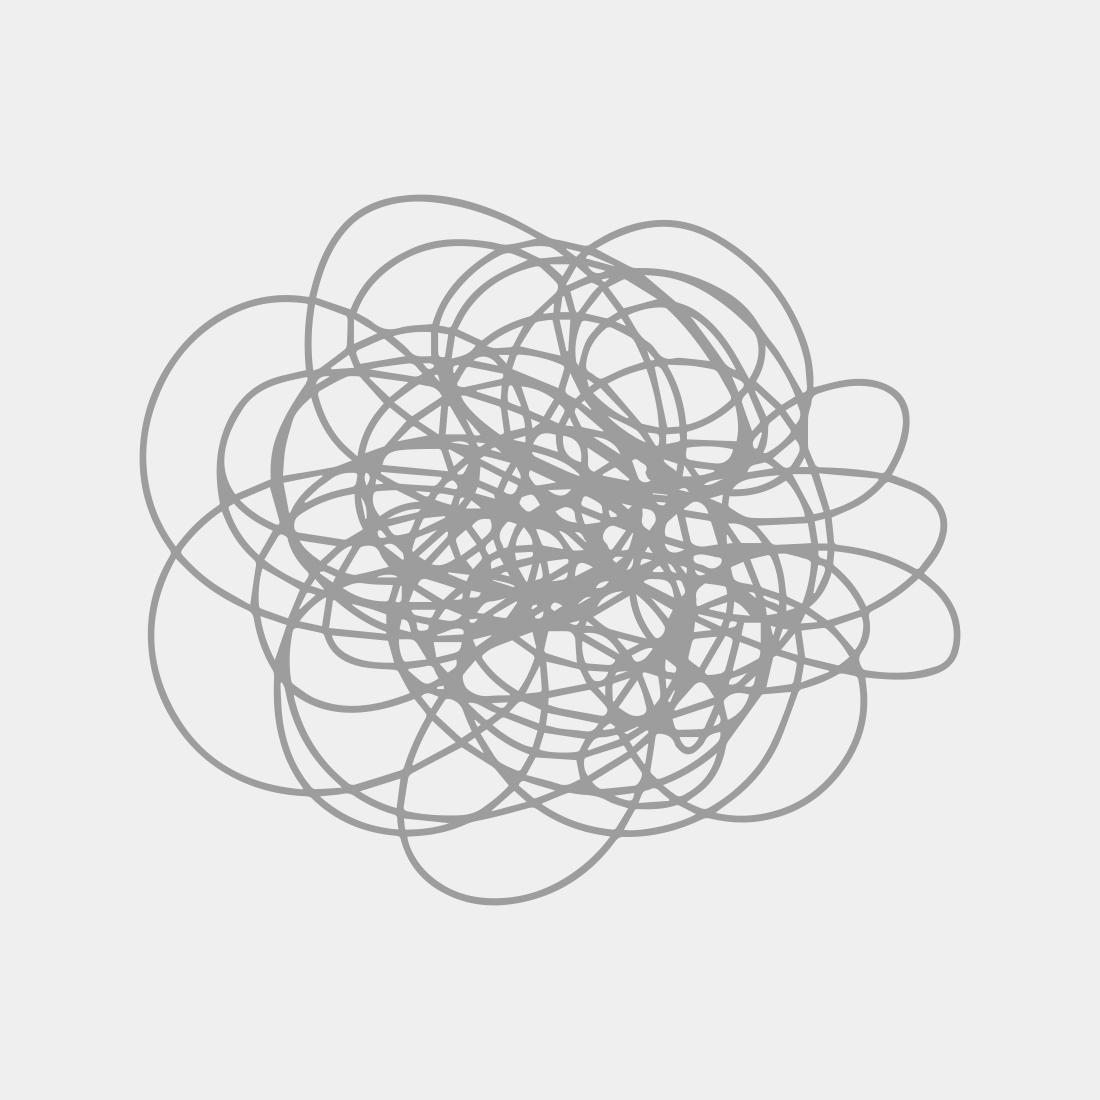 Brief Lessons In Creativity